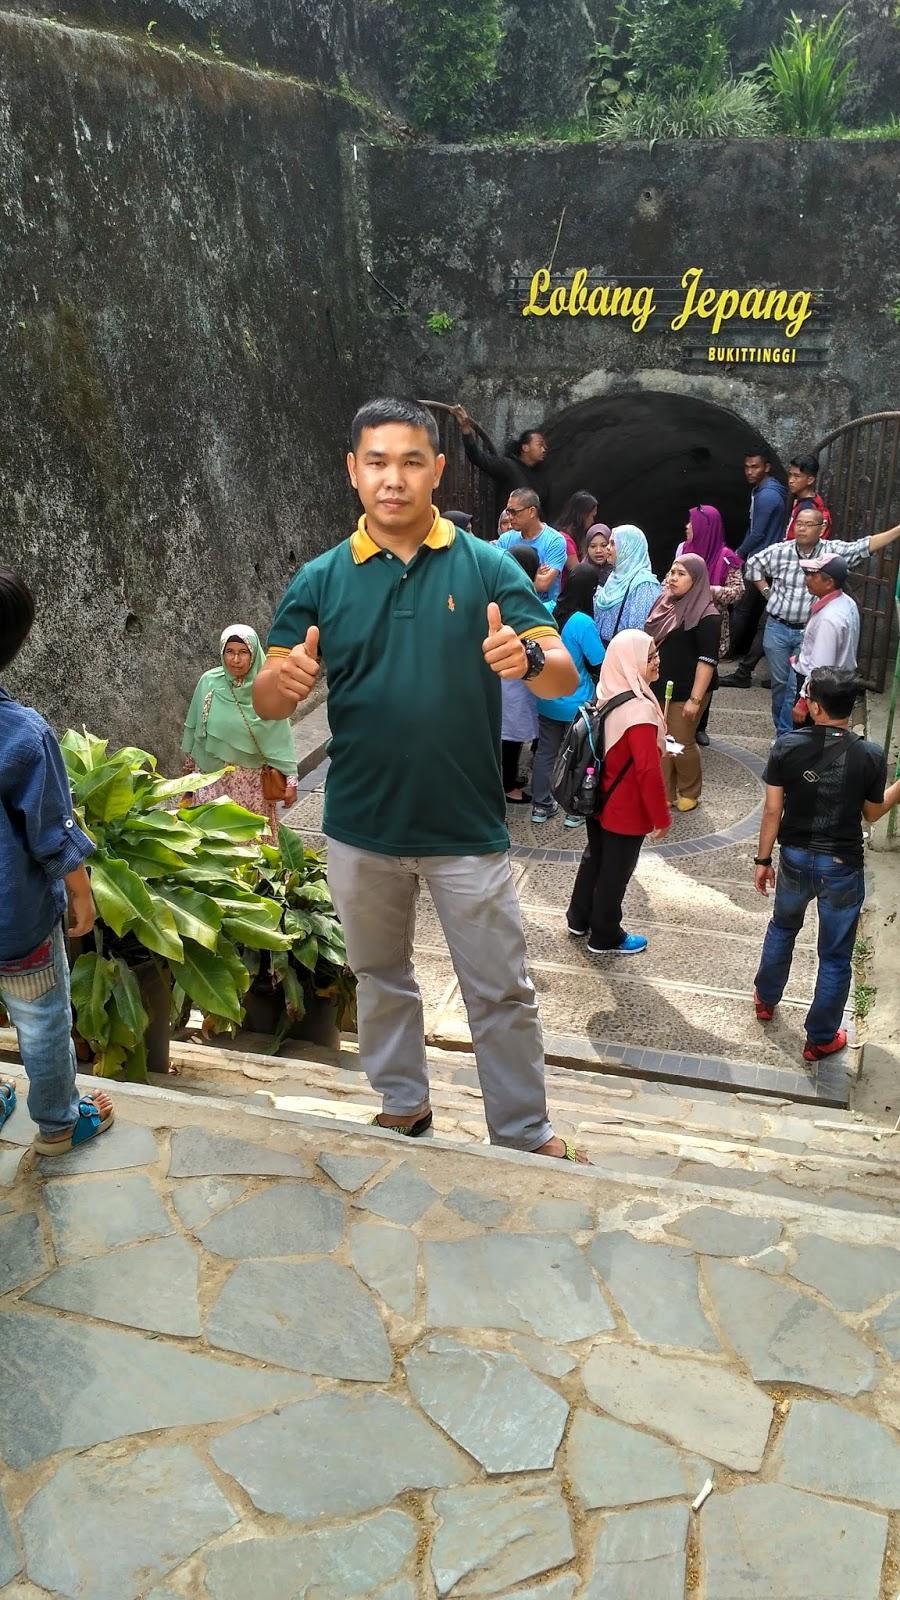 Tutorial Salim : Jalan-jalan ke Lubang Jepang Bukit Tinggi